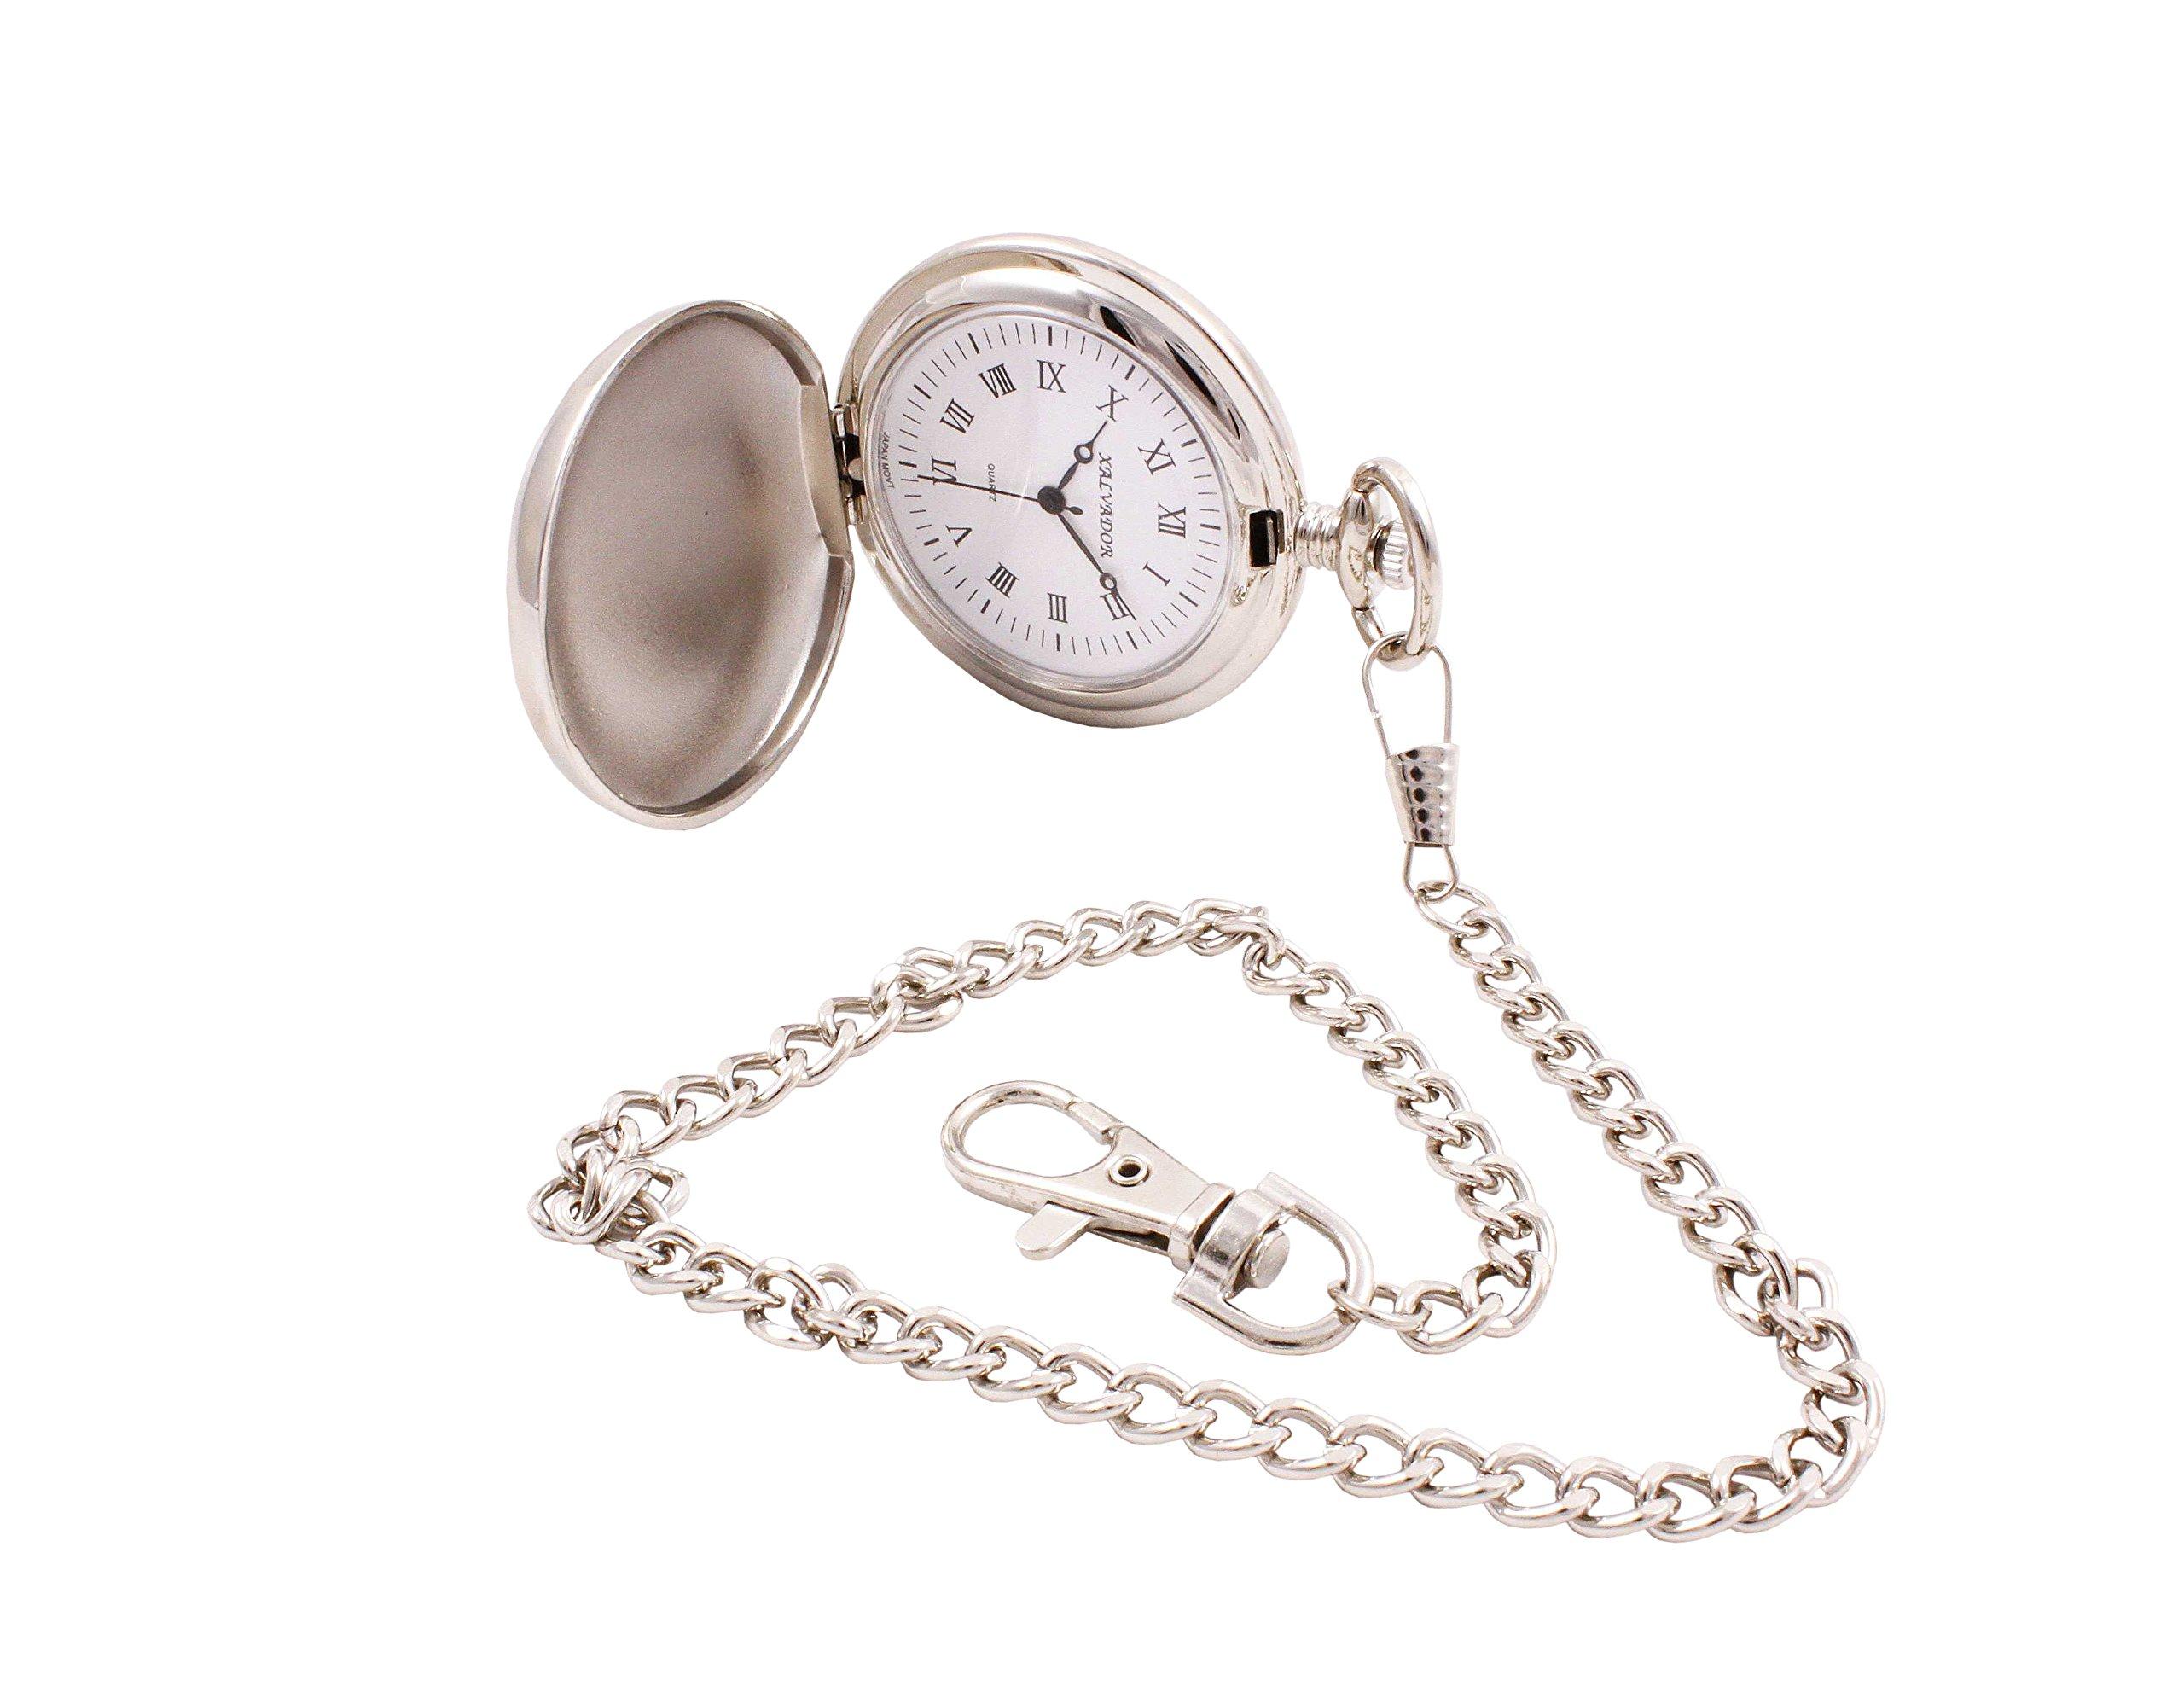 Shoppewatch Pocket Watch Doctor Medical Symbol with Chain Quartz Steampunk Cosplay PW-95 5